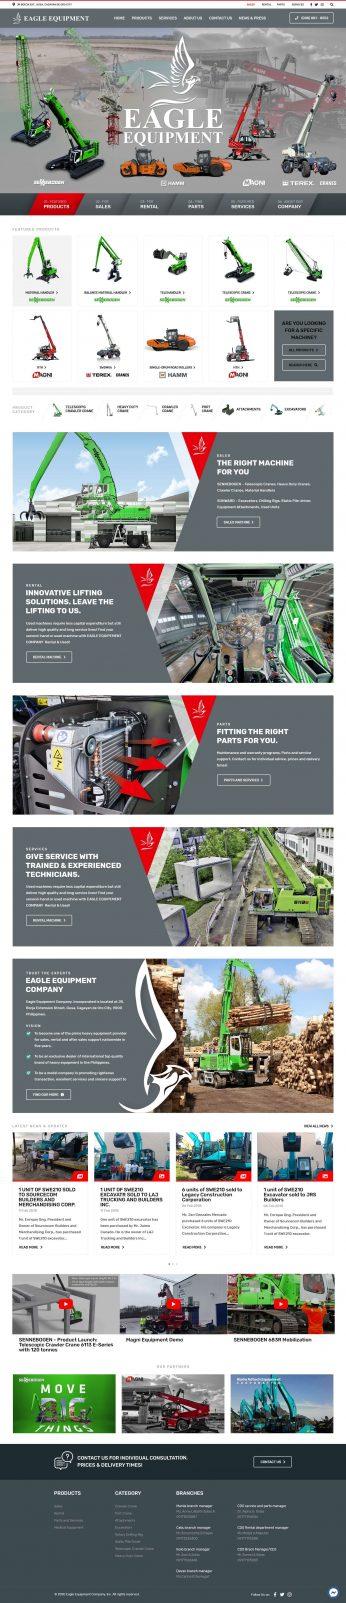 Syntactics Recent Project - Eagle Equipment Inc - Homepage